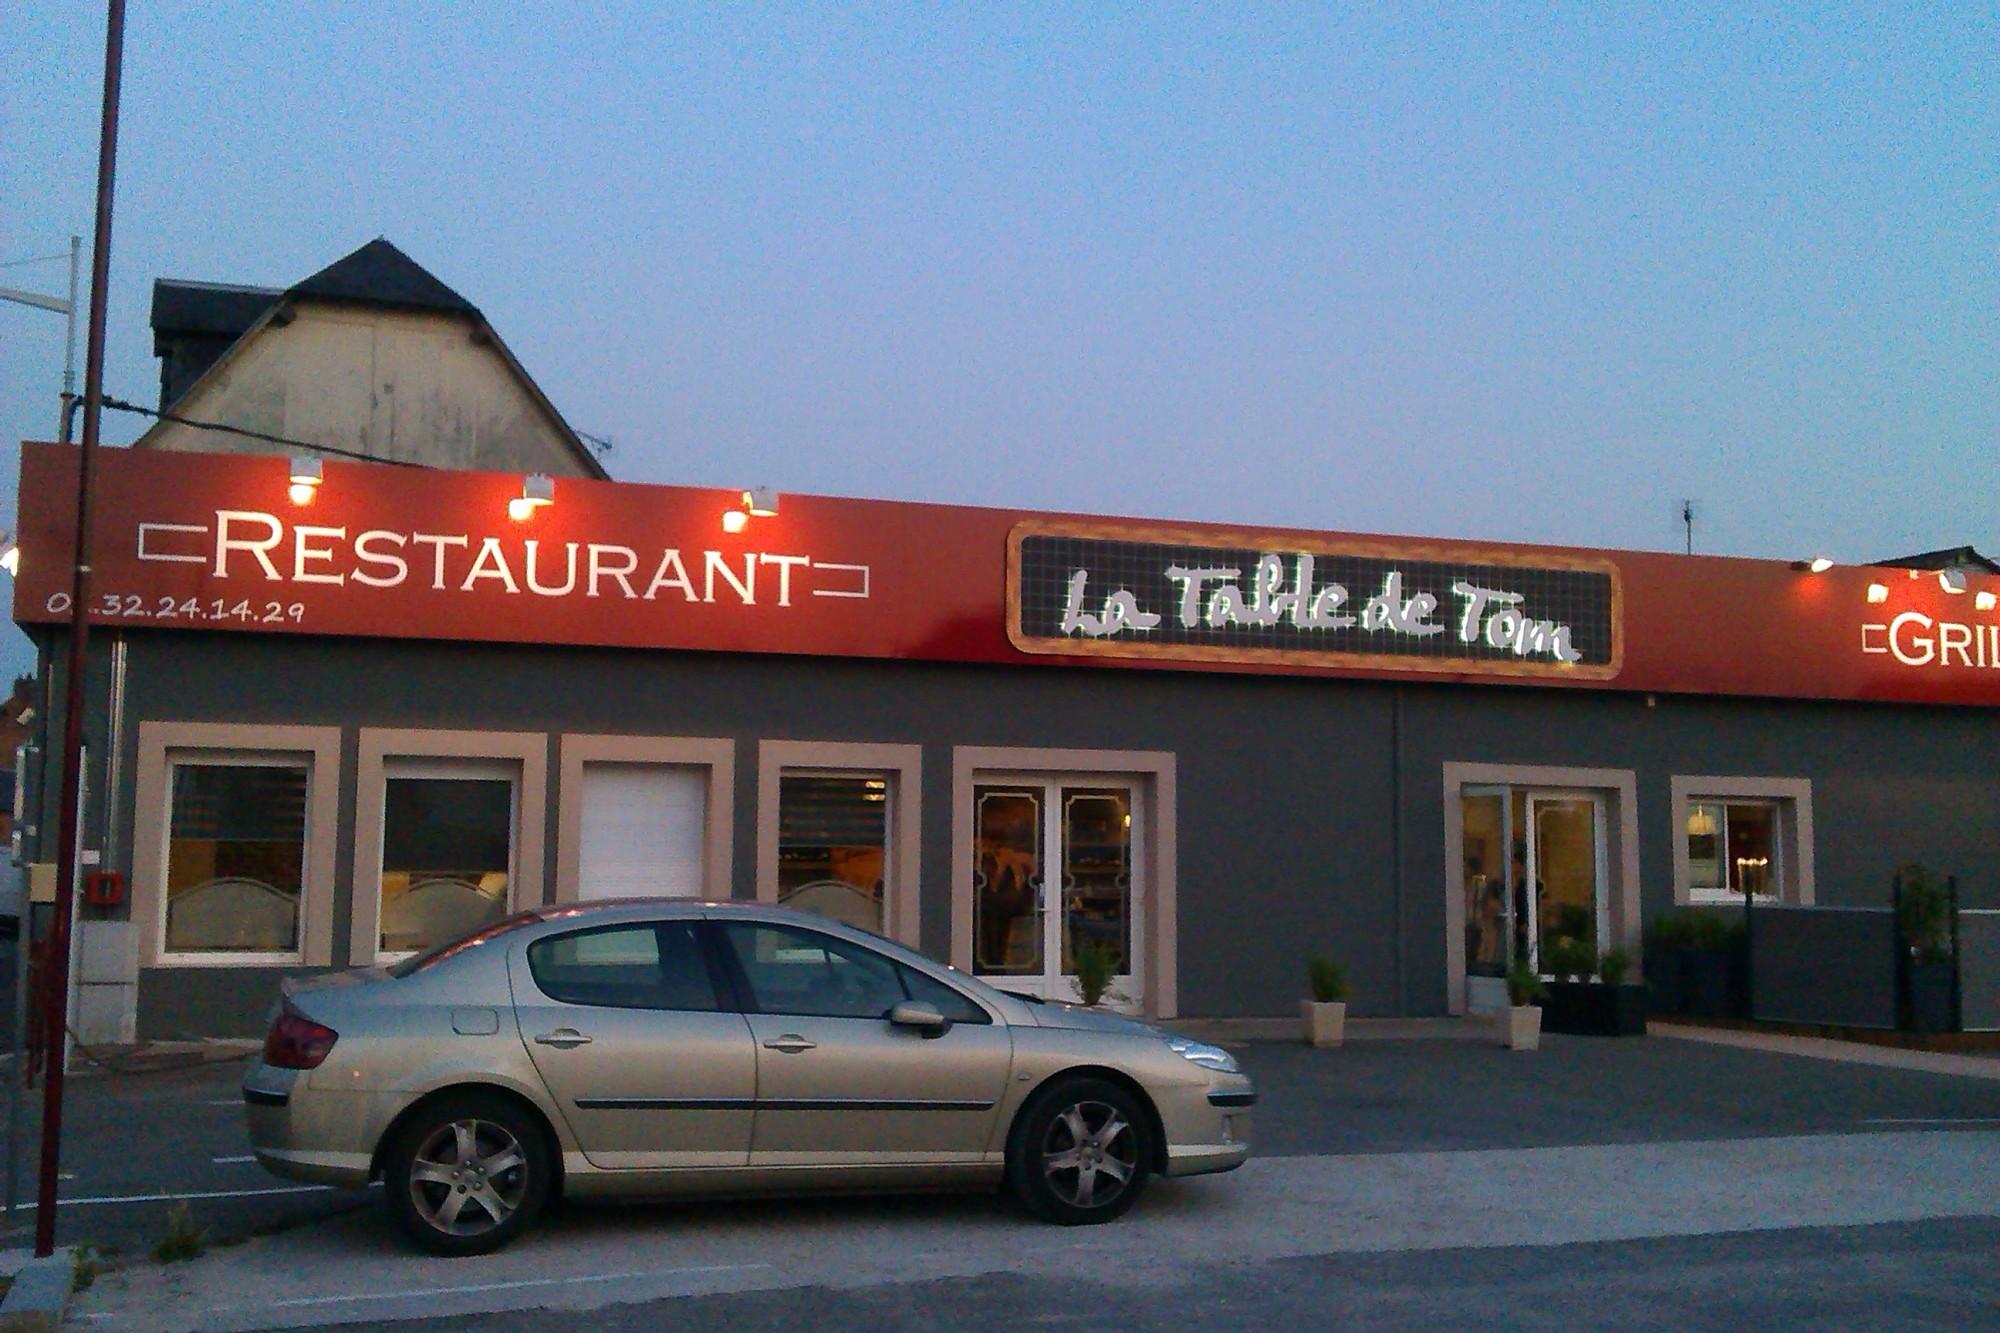 Restaurant Gastronomique Au Neubourg